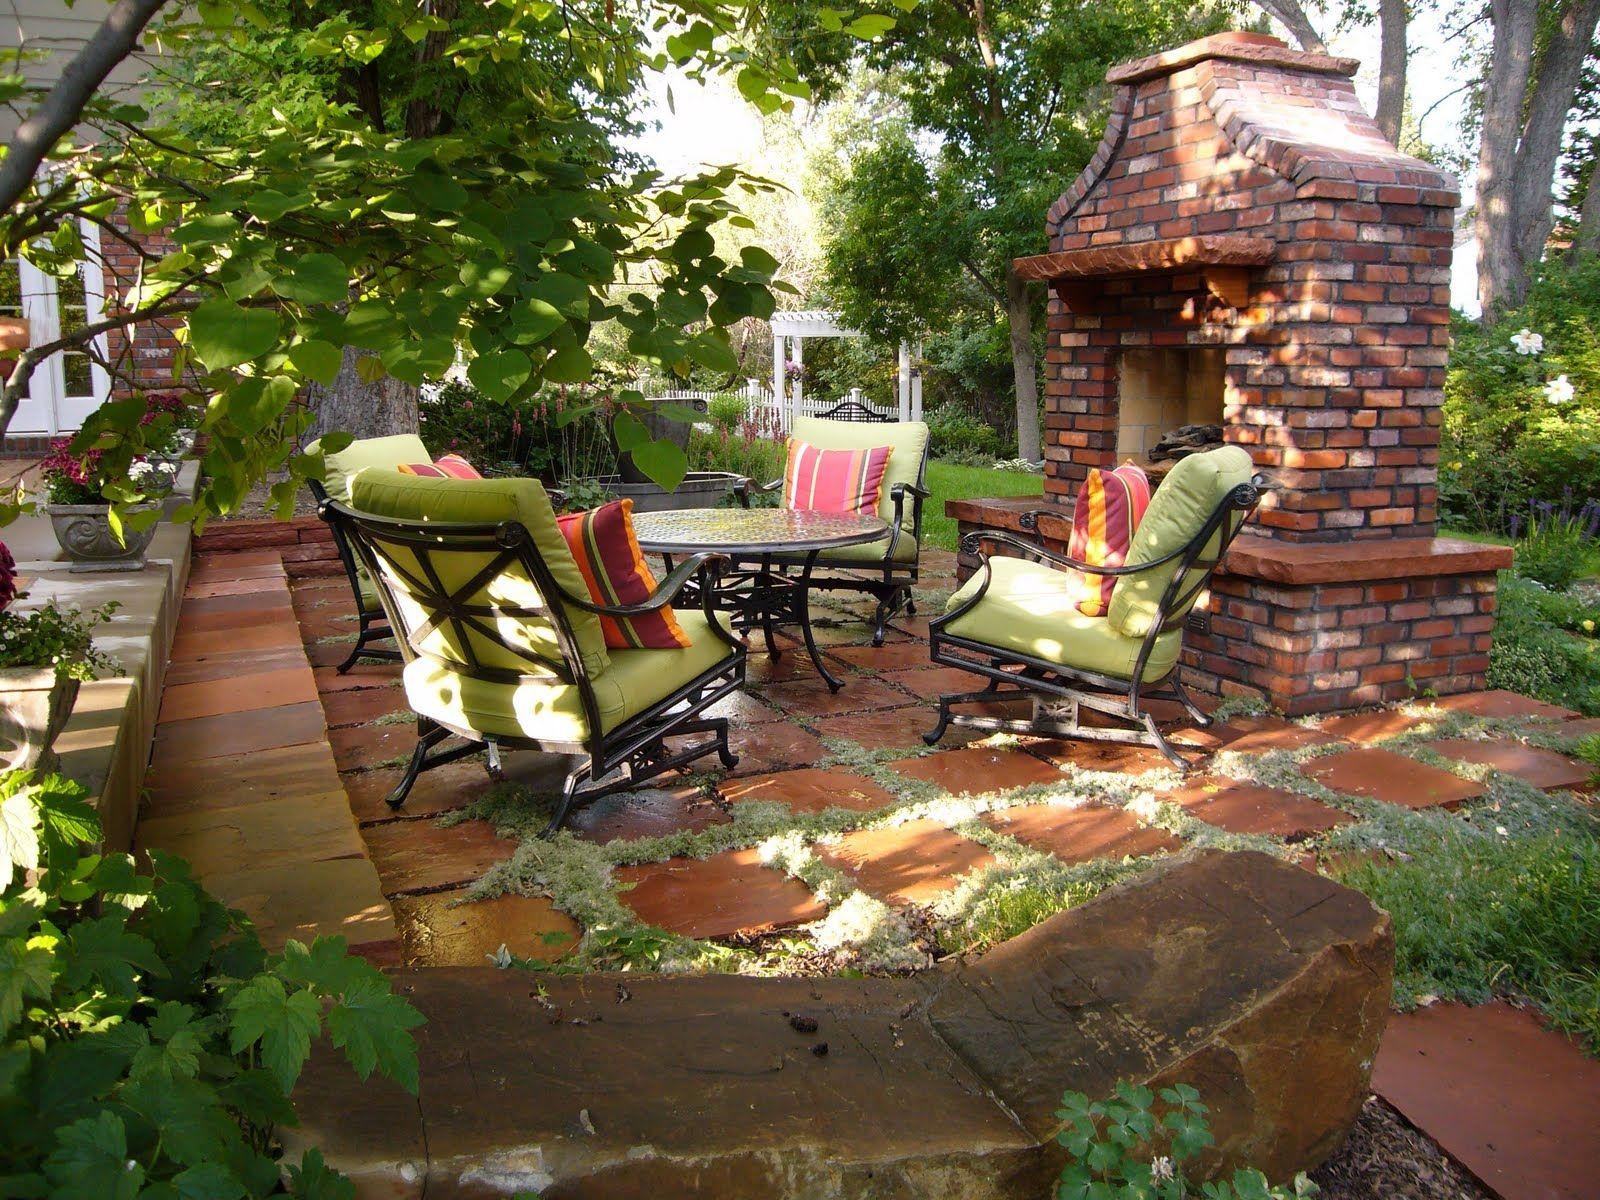 covered patio designs uk | CrowdBackers.com | Backyard ... on Patio Cover Ideas Uk id=37743